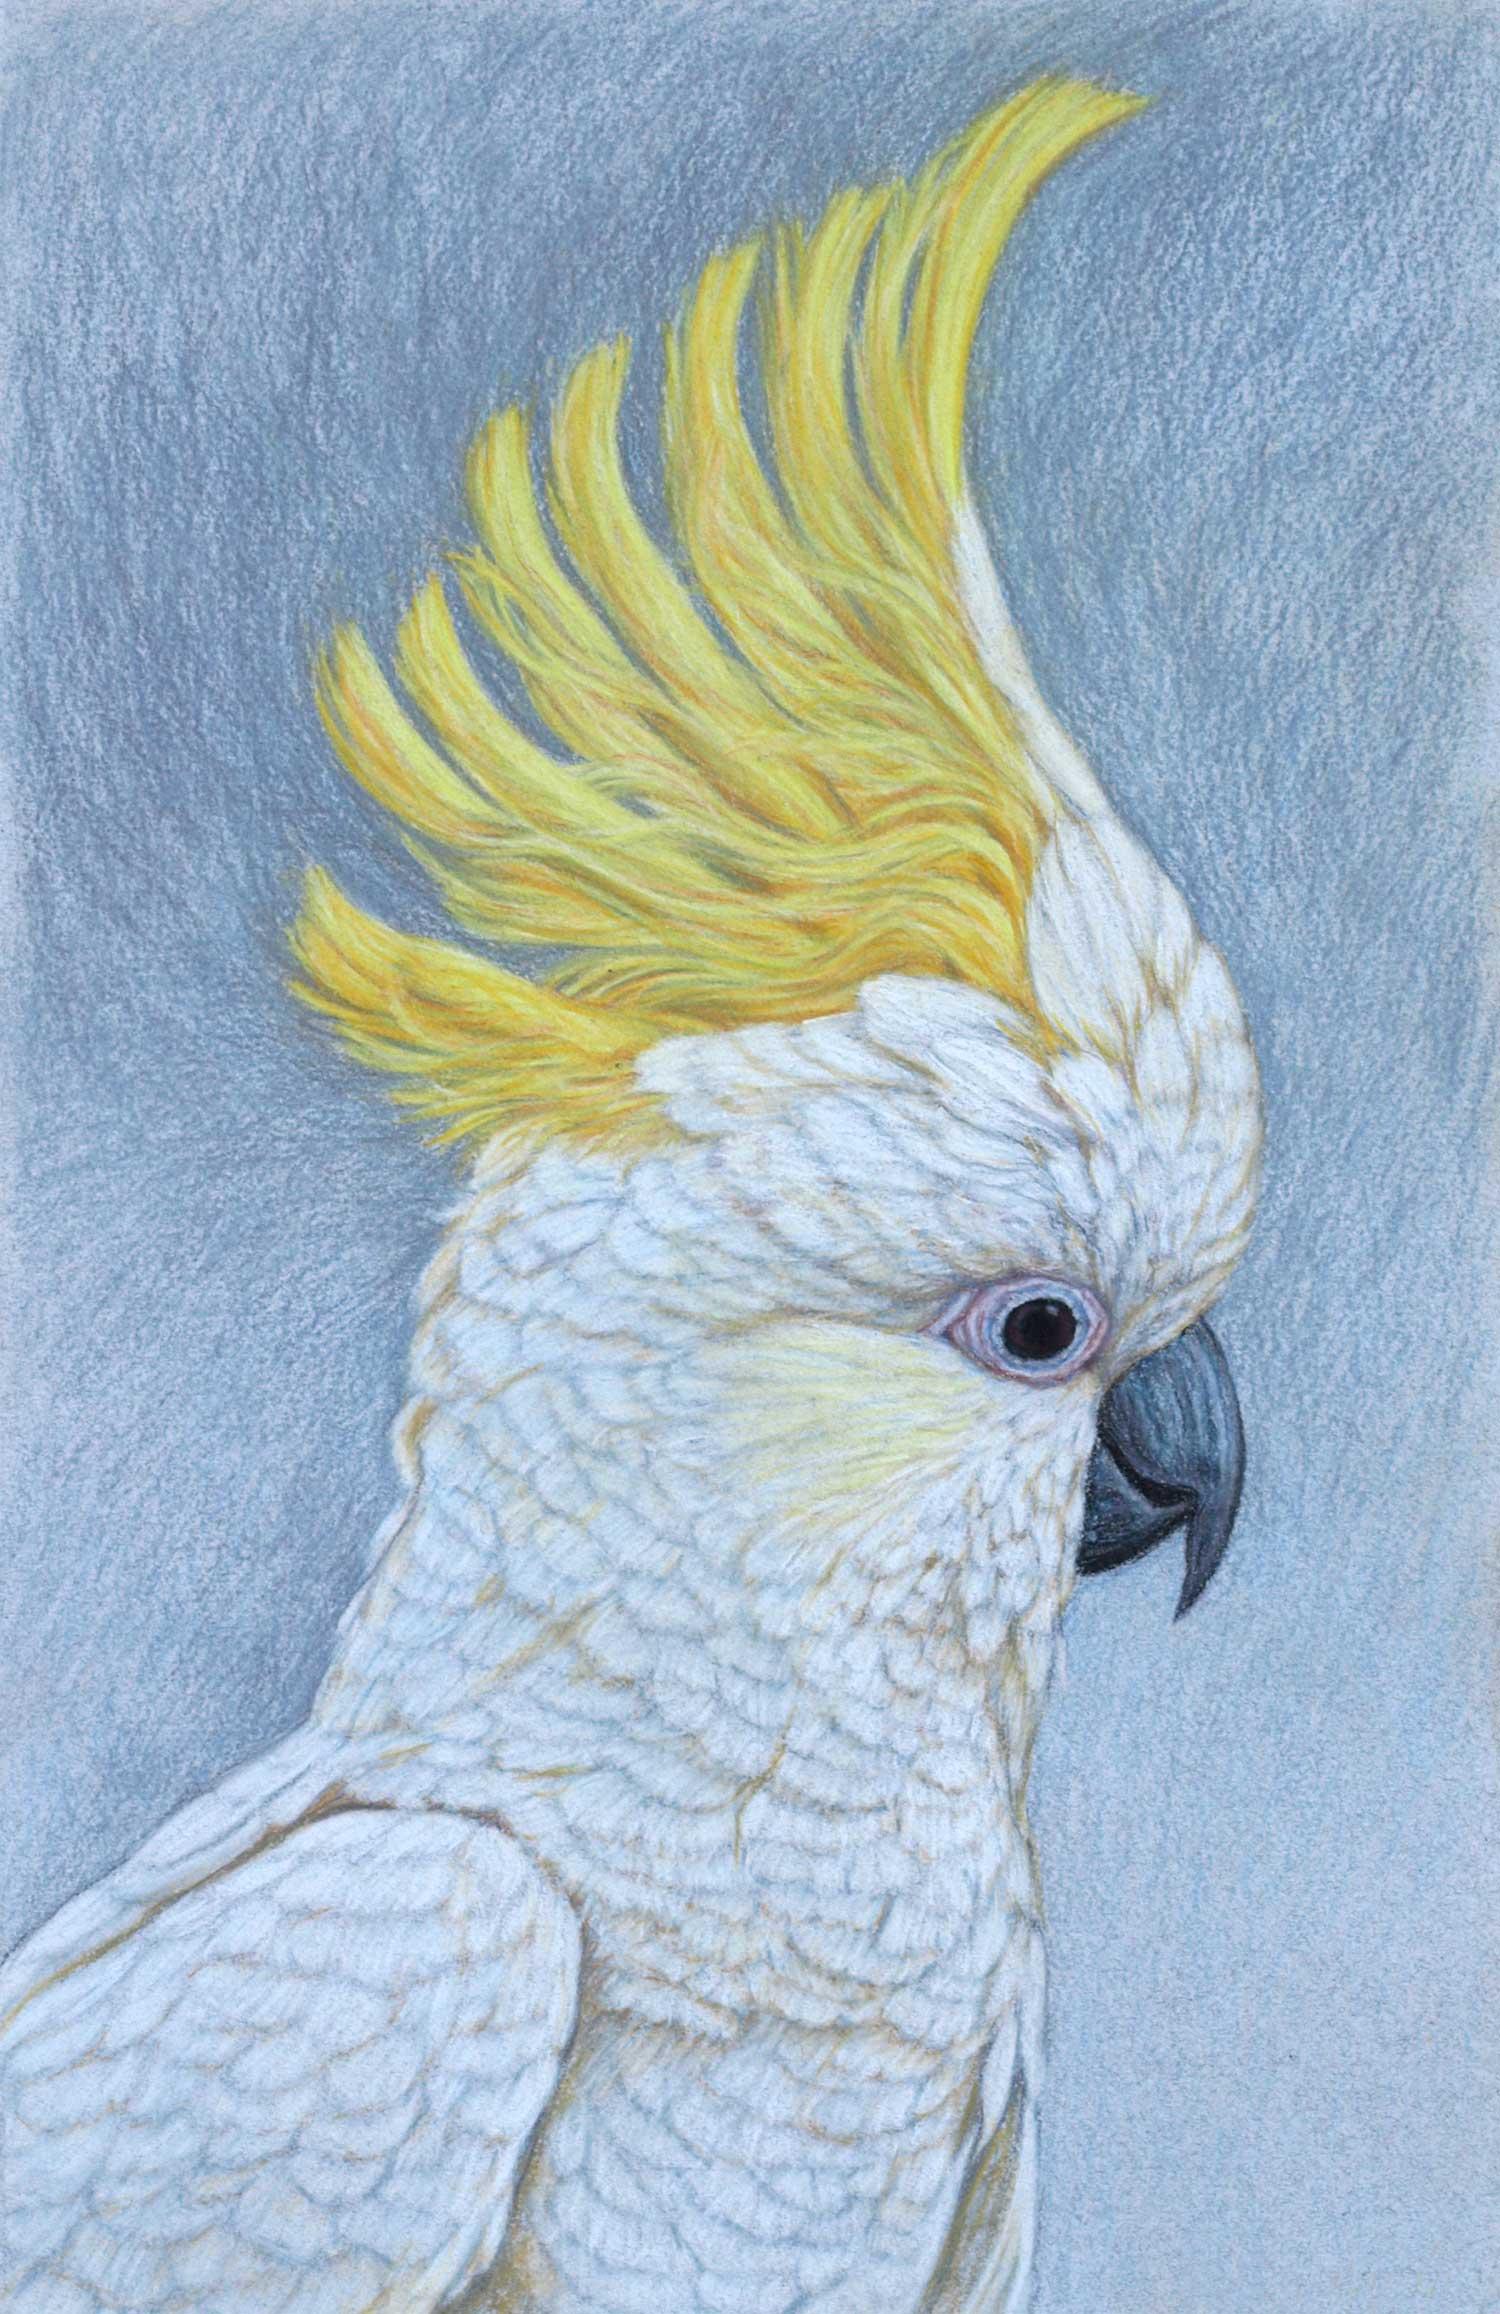 sulphur-crested-cockatoo-3-drawing-rachel-newling.jpg